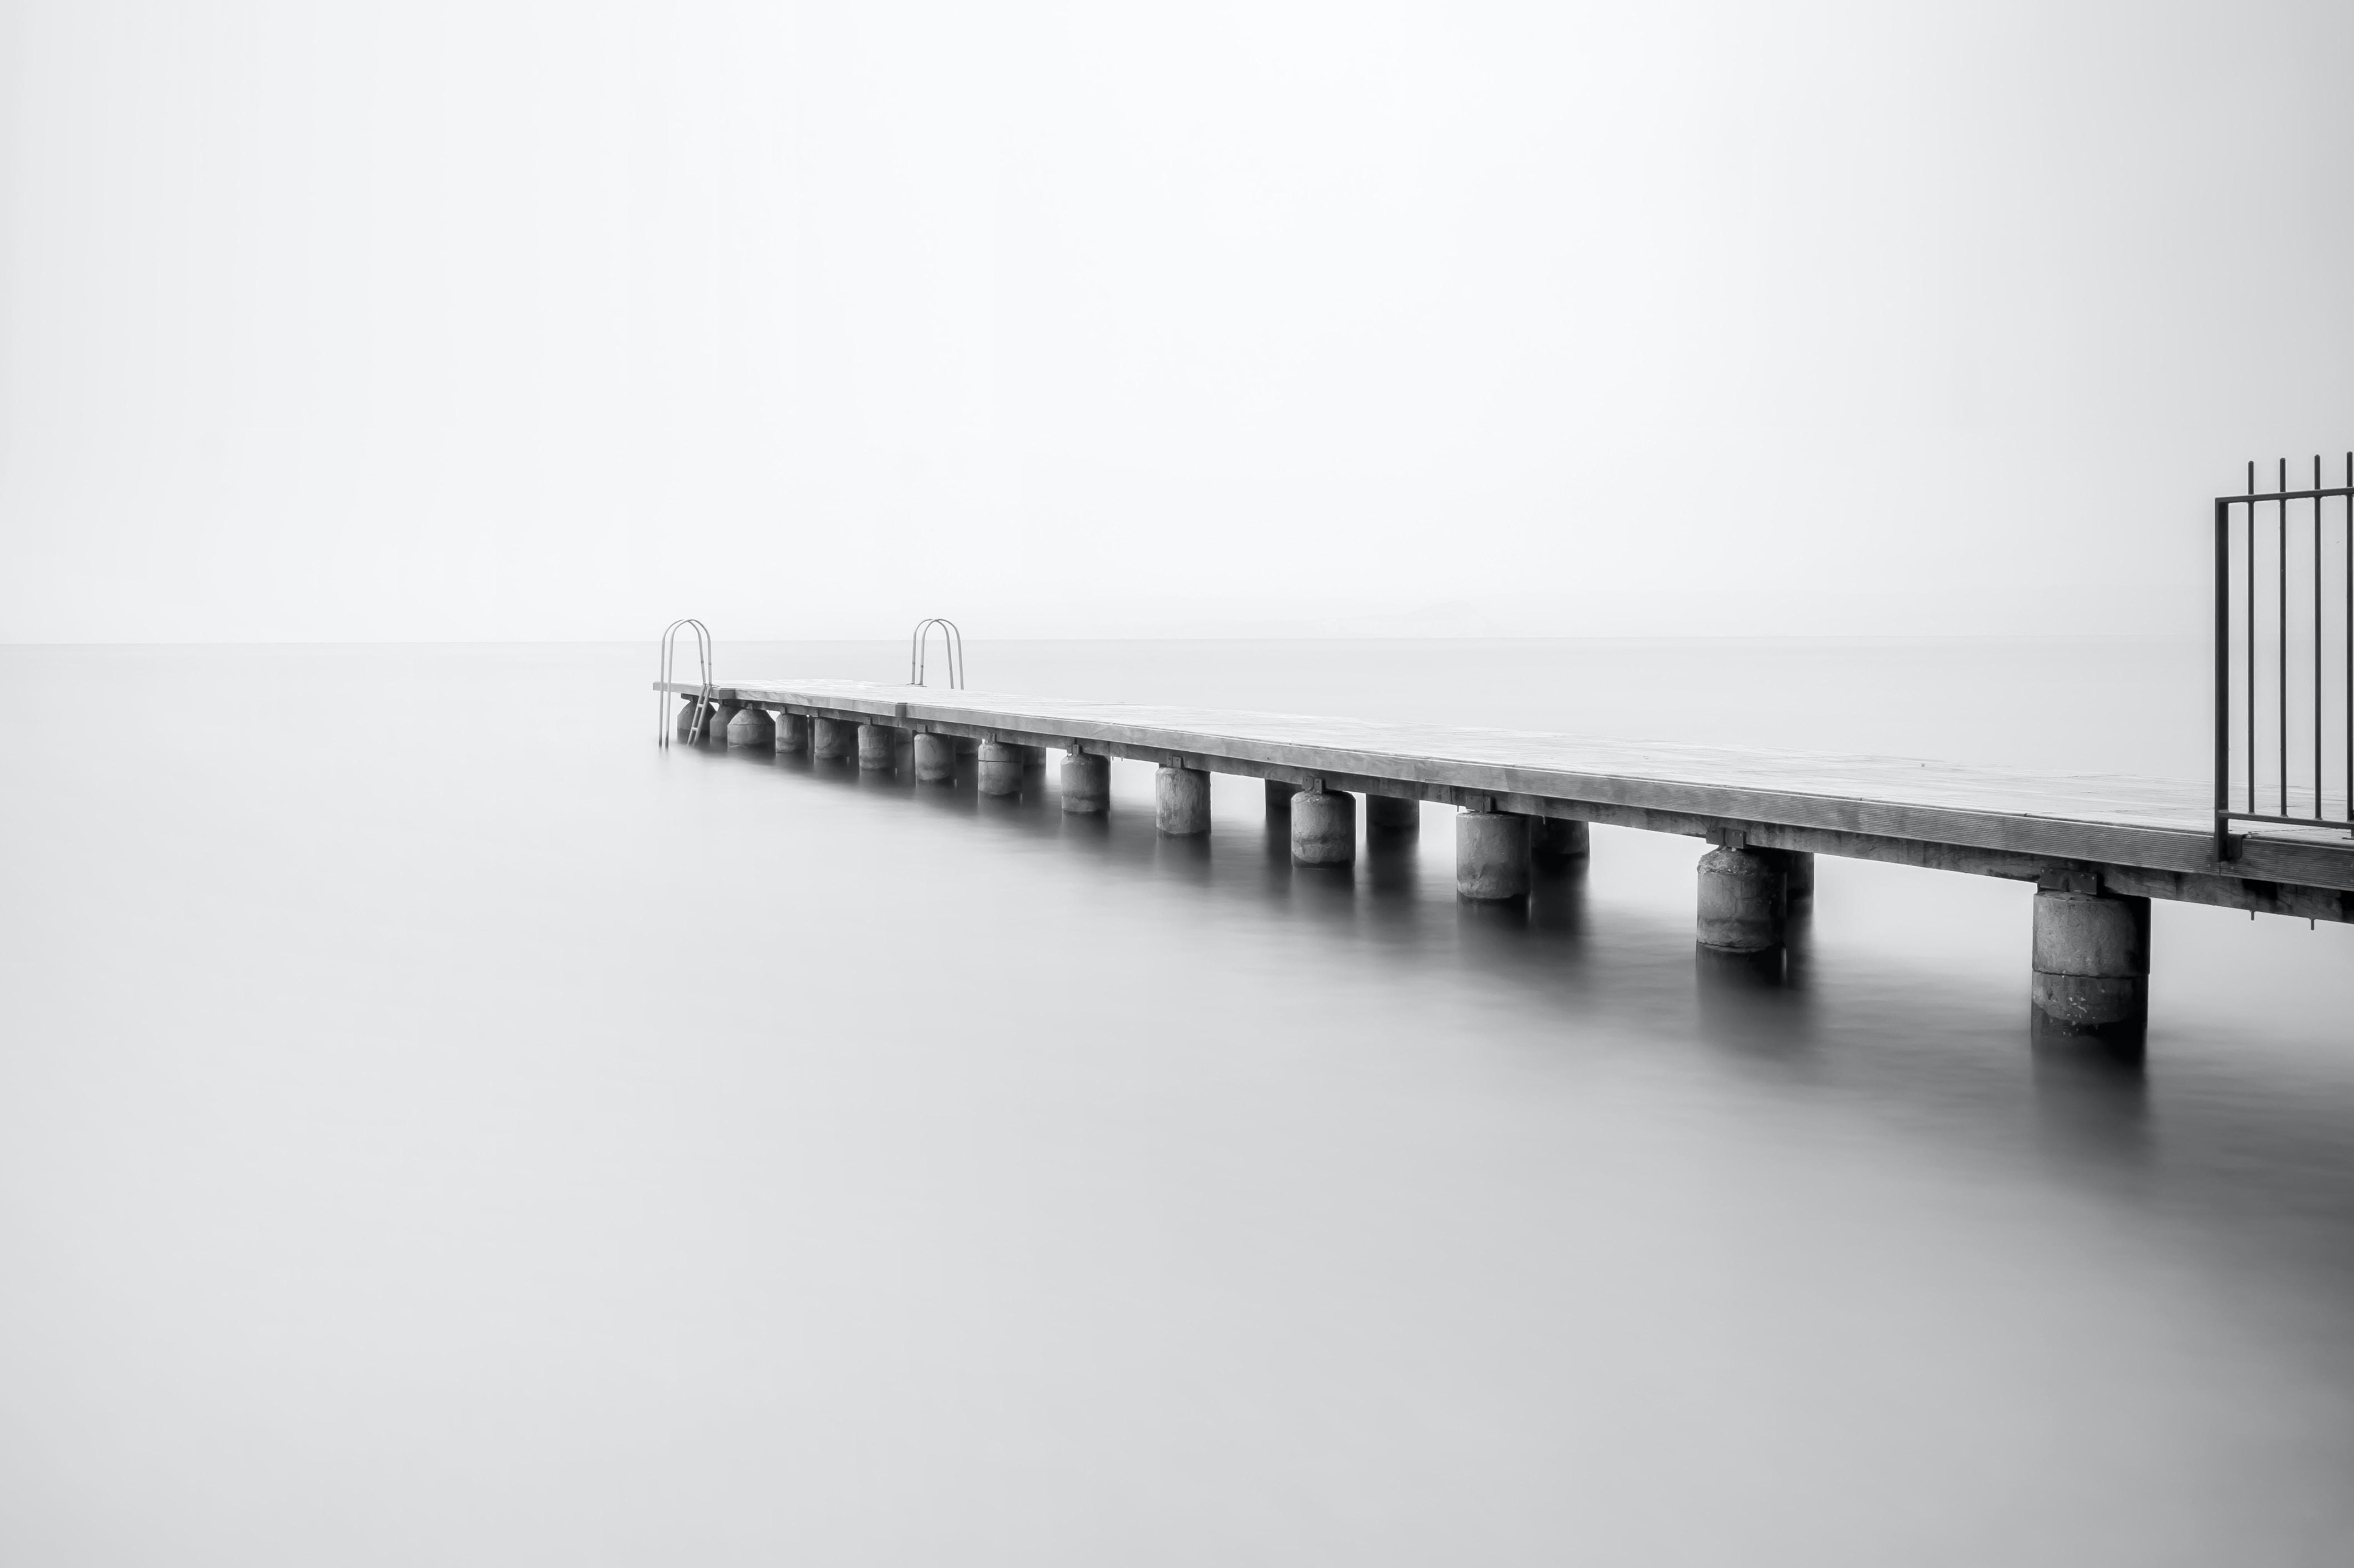 grayscale photo of concrete dock